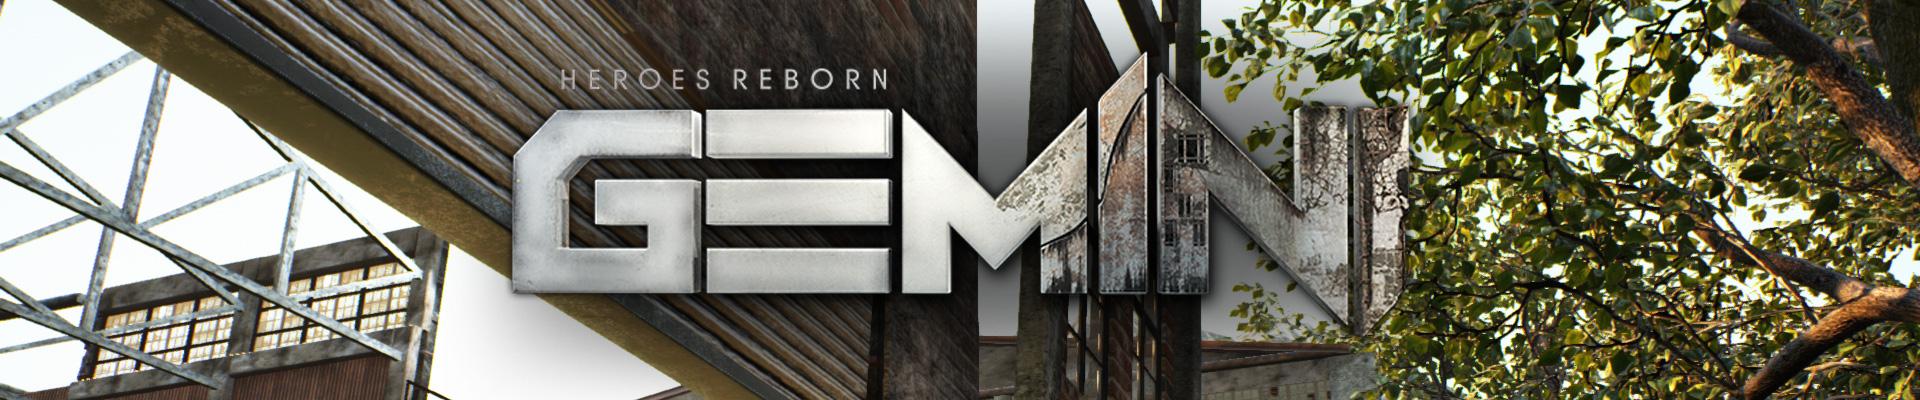 Гадкий утёнок: Gemini: Heroes Reborn